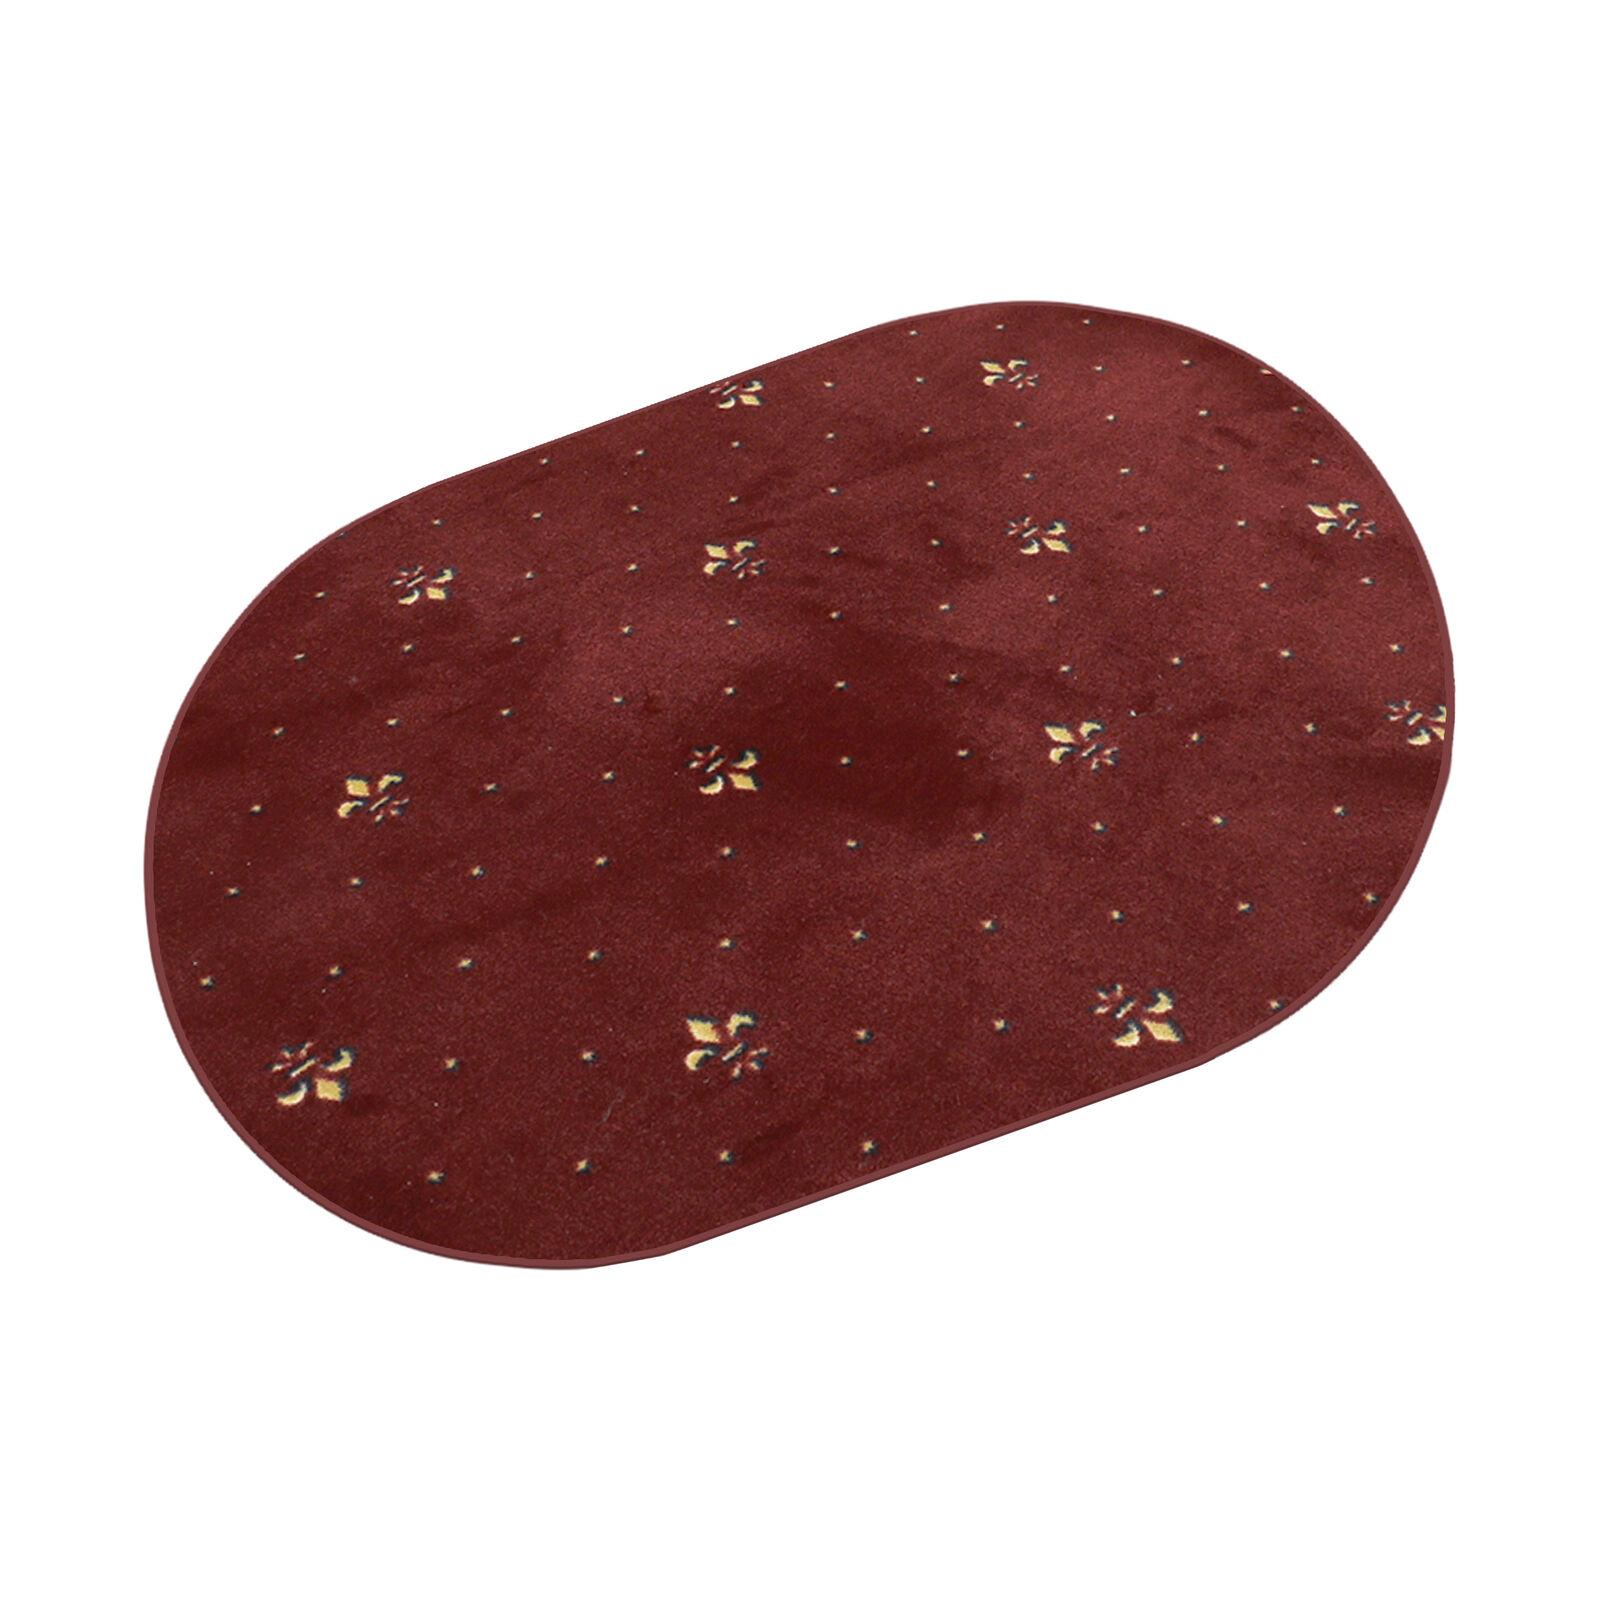 Fleur Hotel rot HEVO ® Kettel Teppich Vintage Muster 200x280 cm Oval